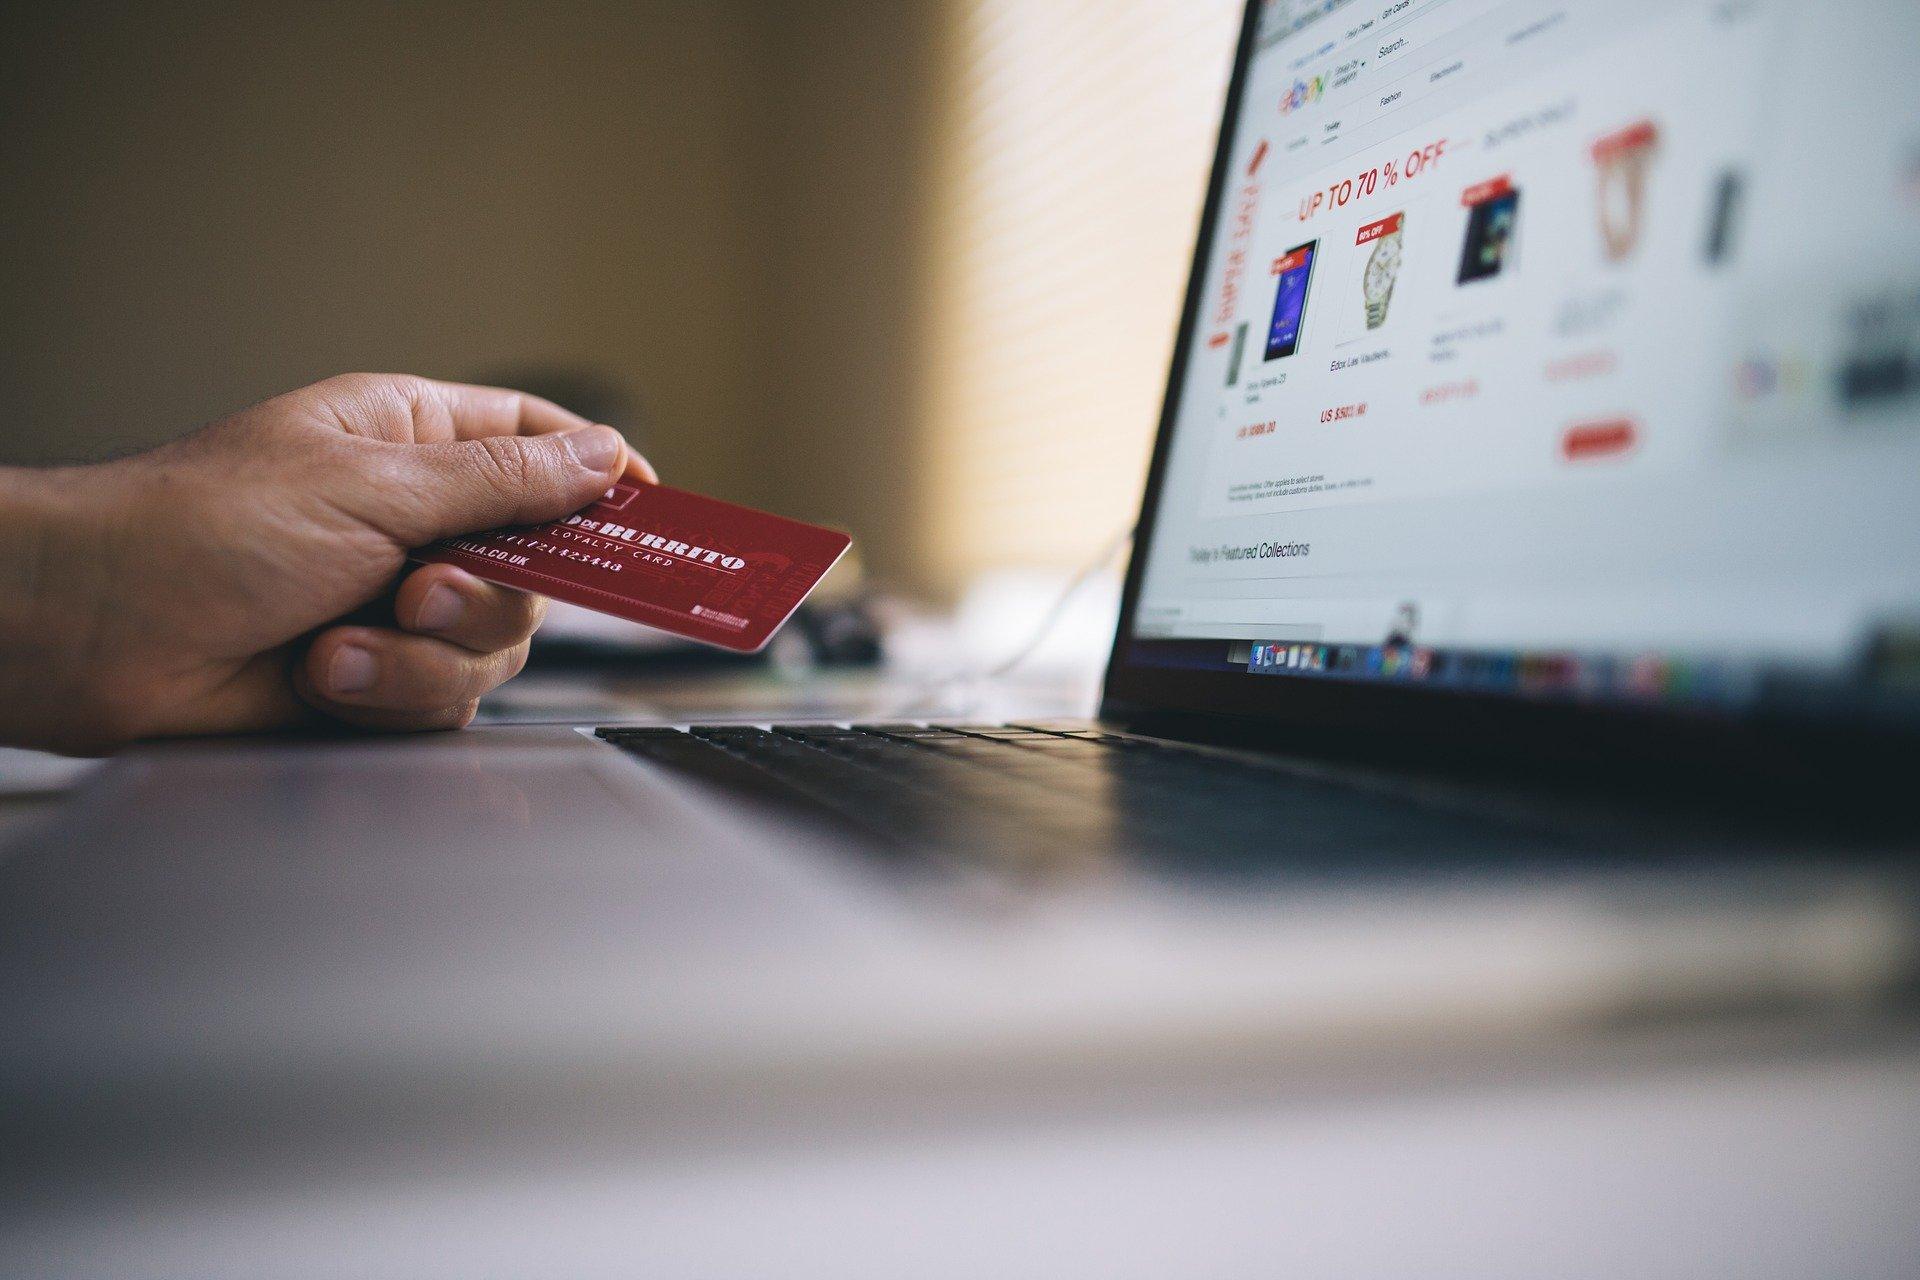 recibir-pagos-de-clientes-online-flexio-1